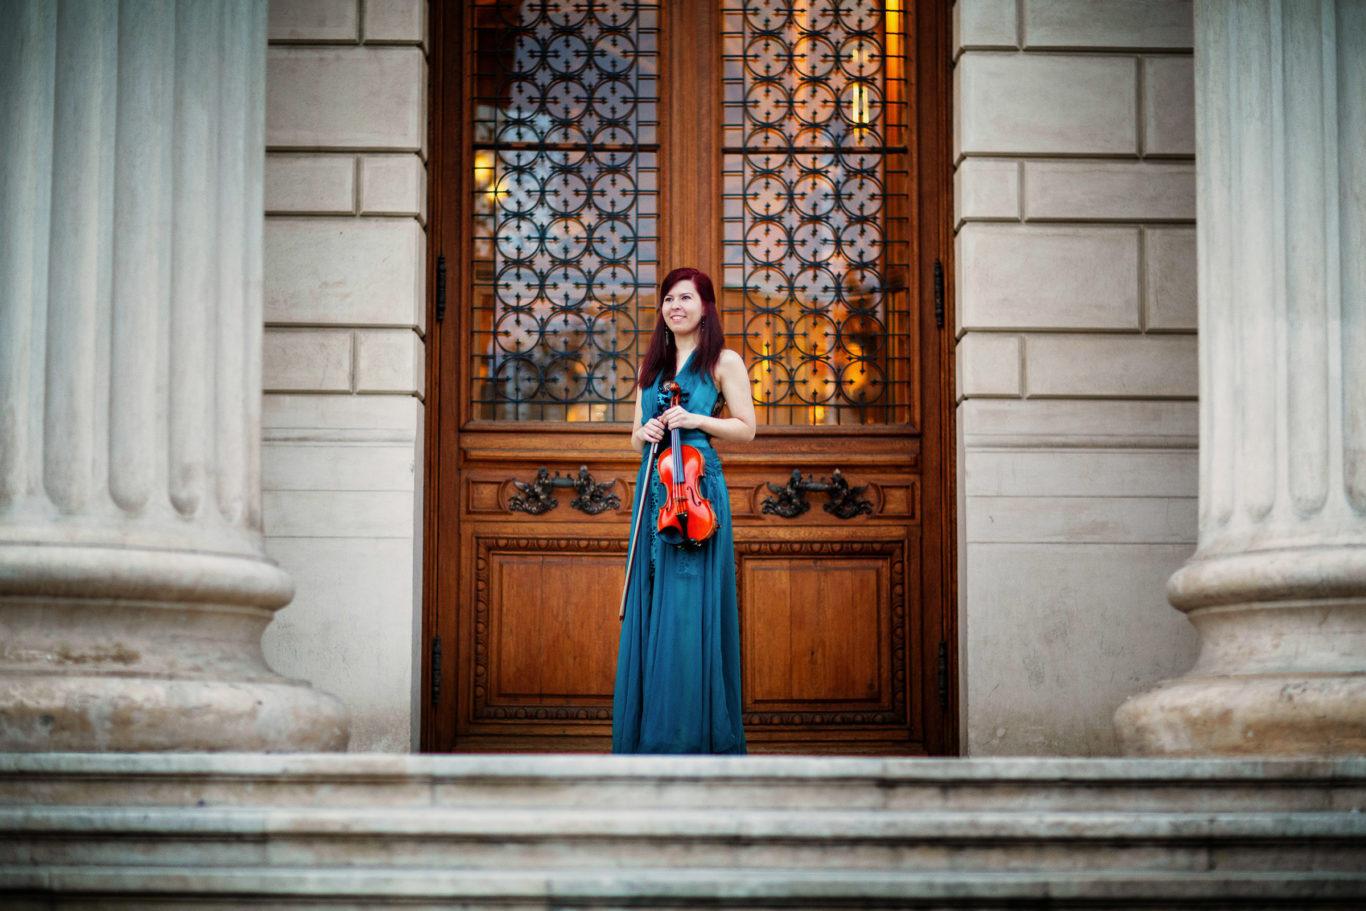 0036-Fotografii-corporate-Emanuela-Matei-fotograf-Ciprian-Dumitrescu-DCF_8235